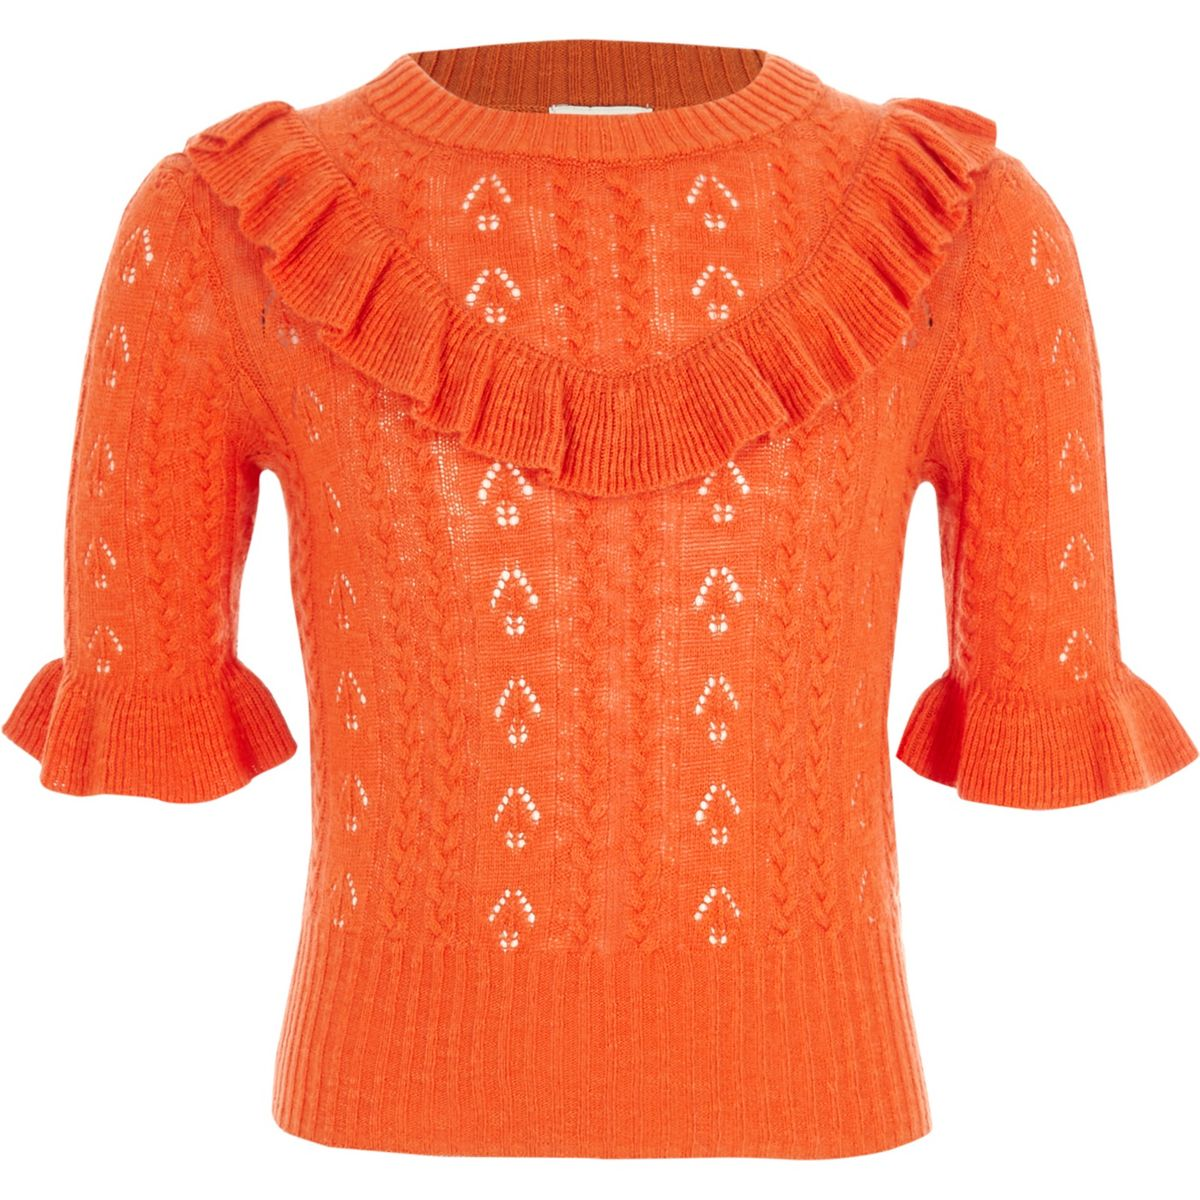 Girls orange frill pointelle knit jumper